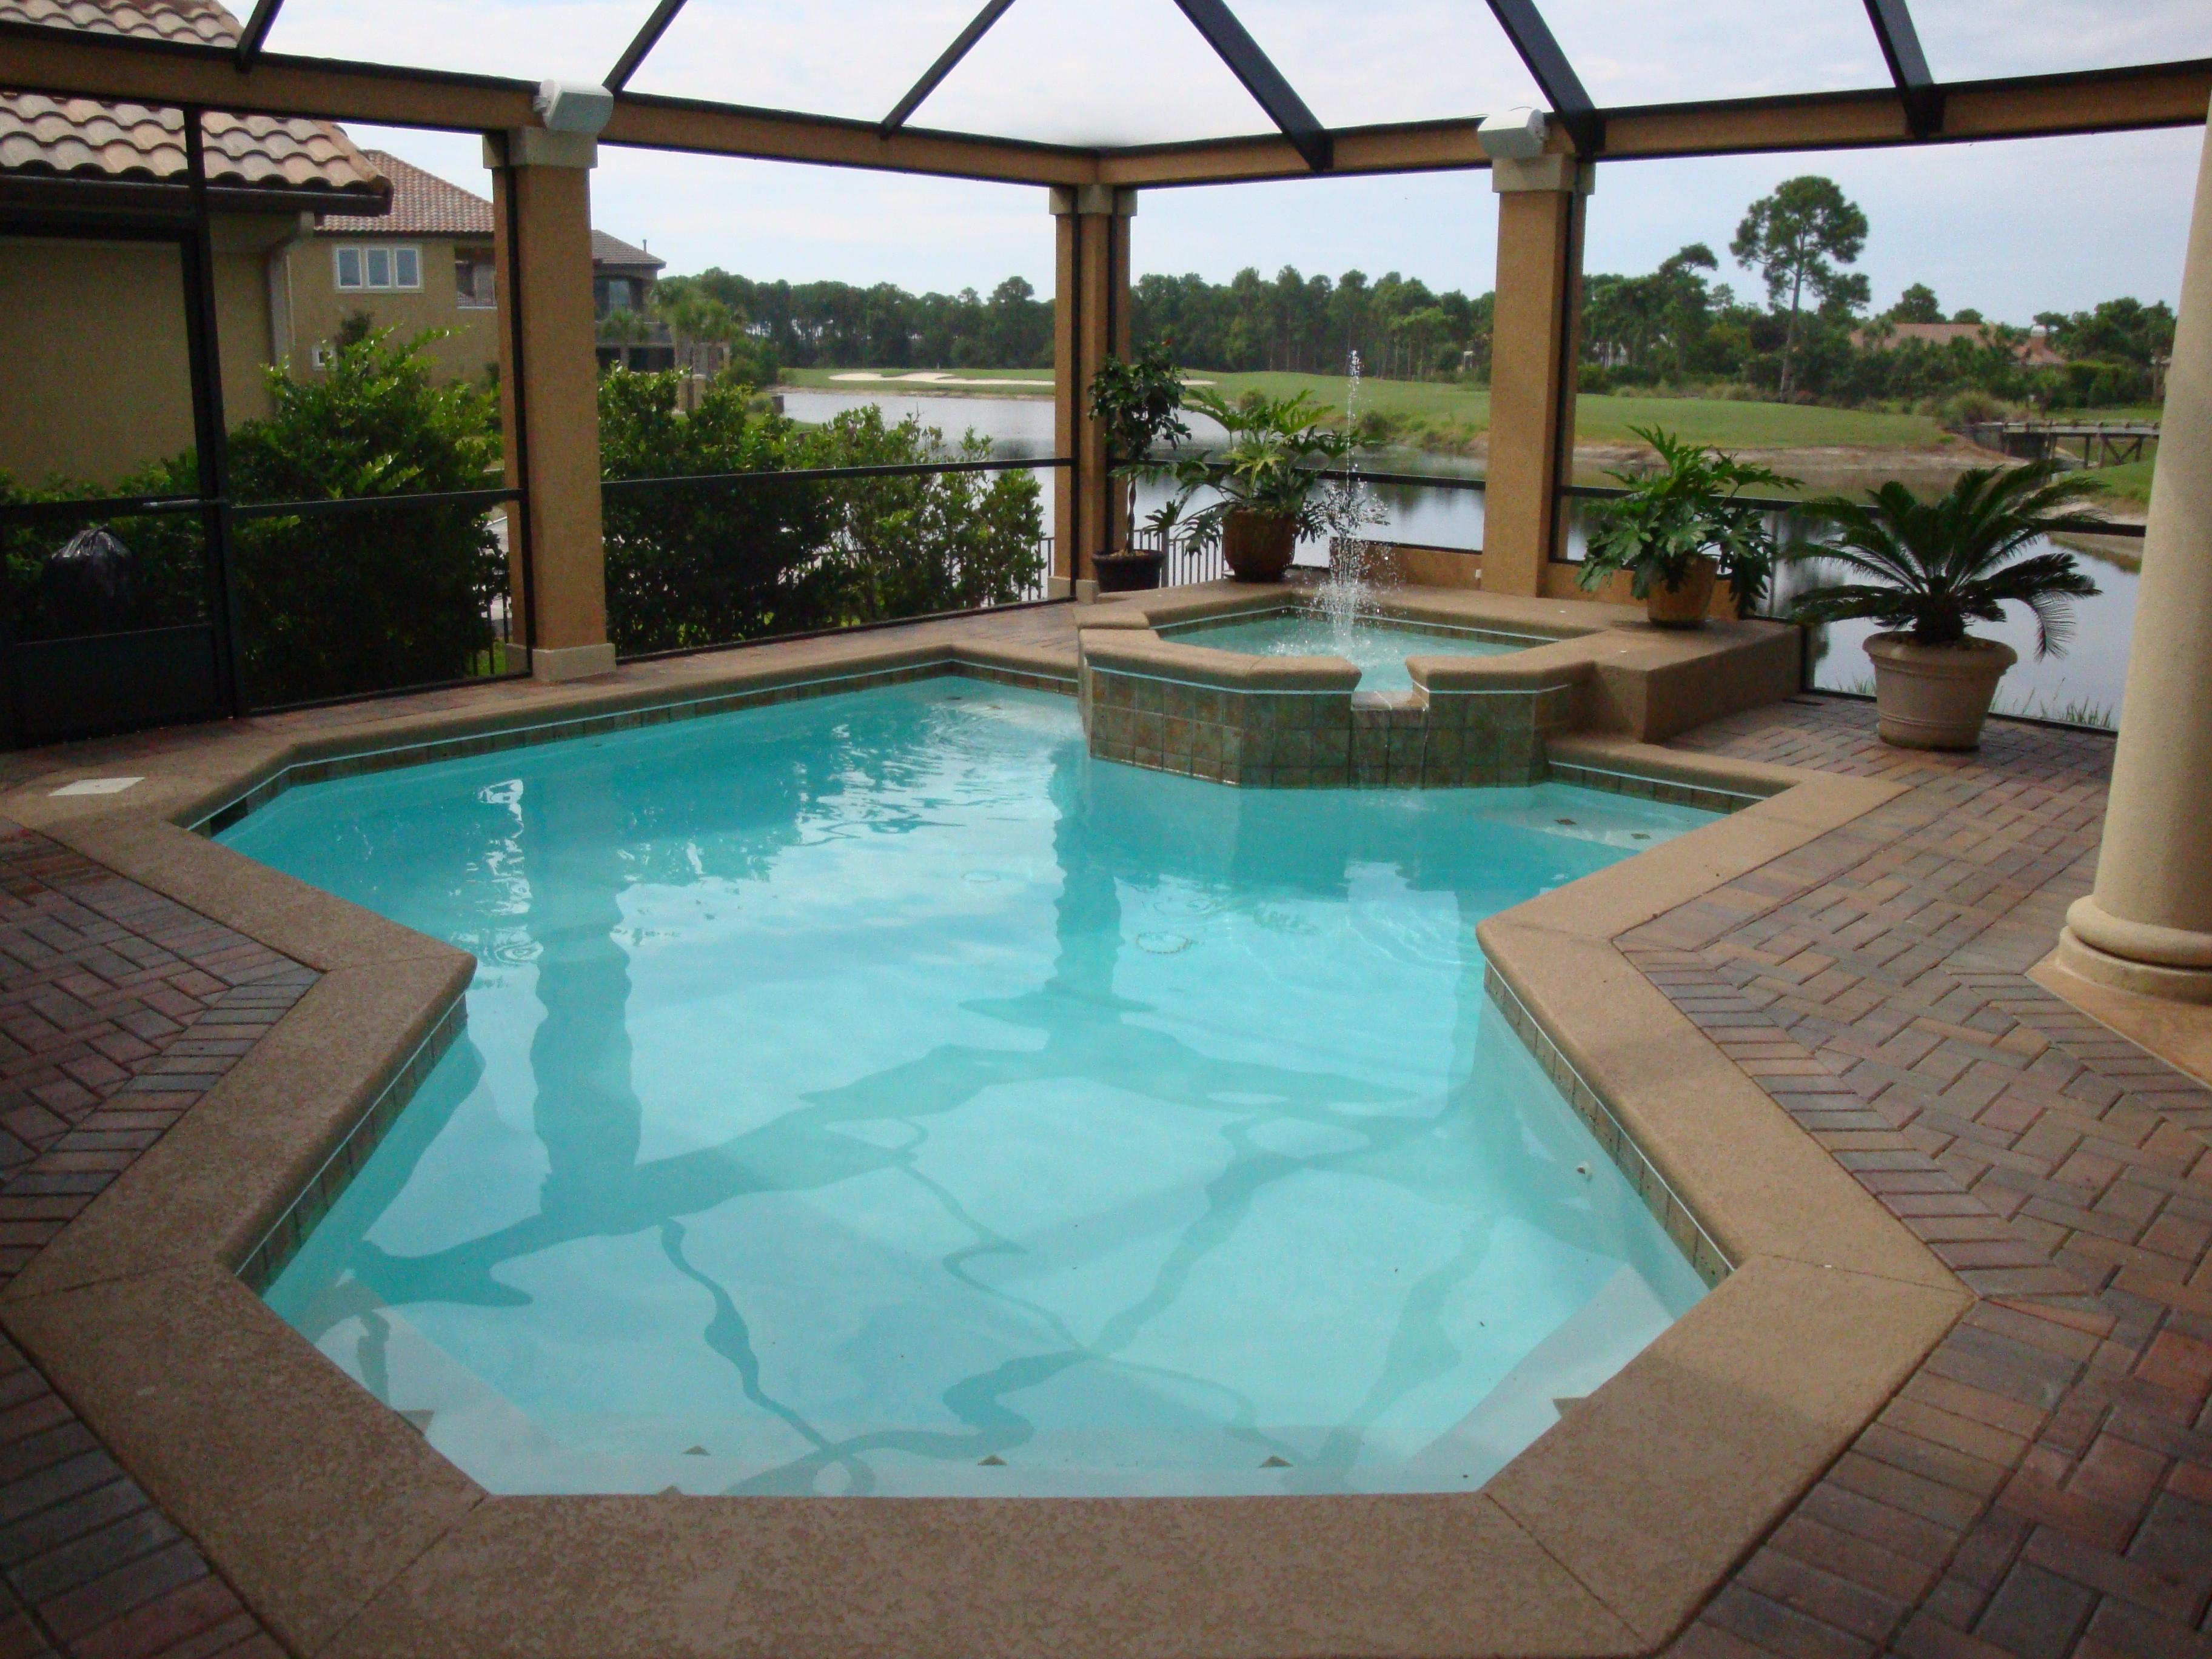 Fort Walton Pools Inc